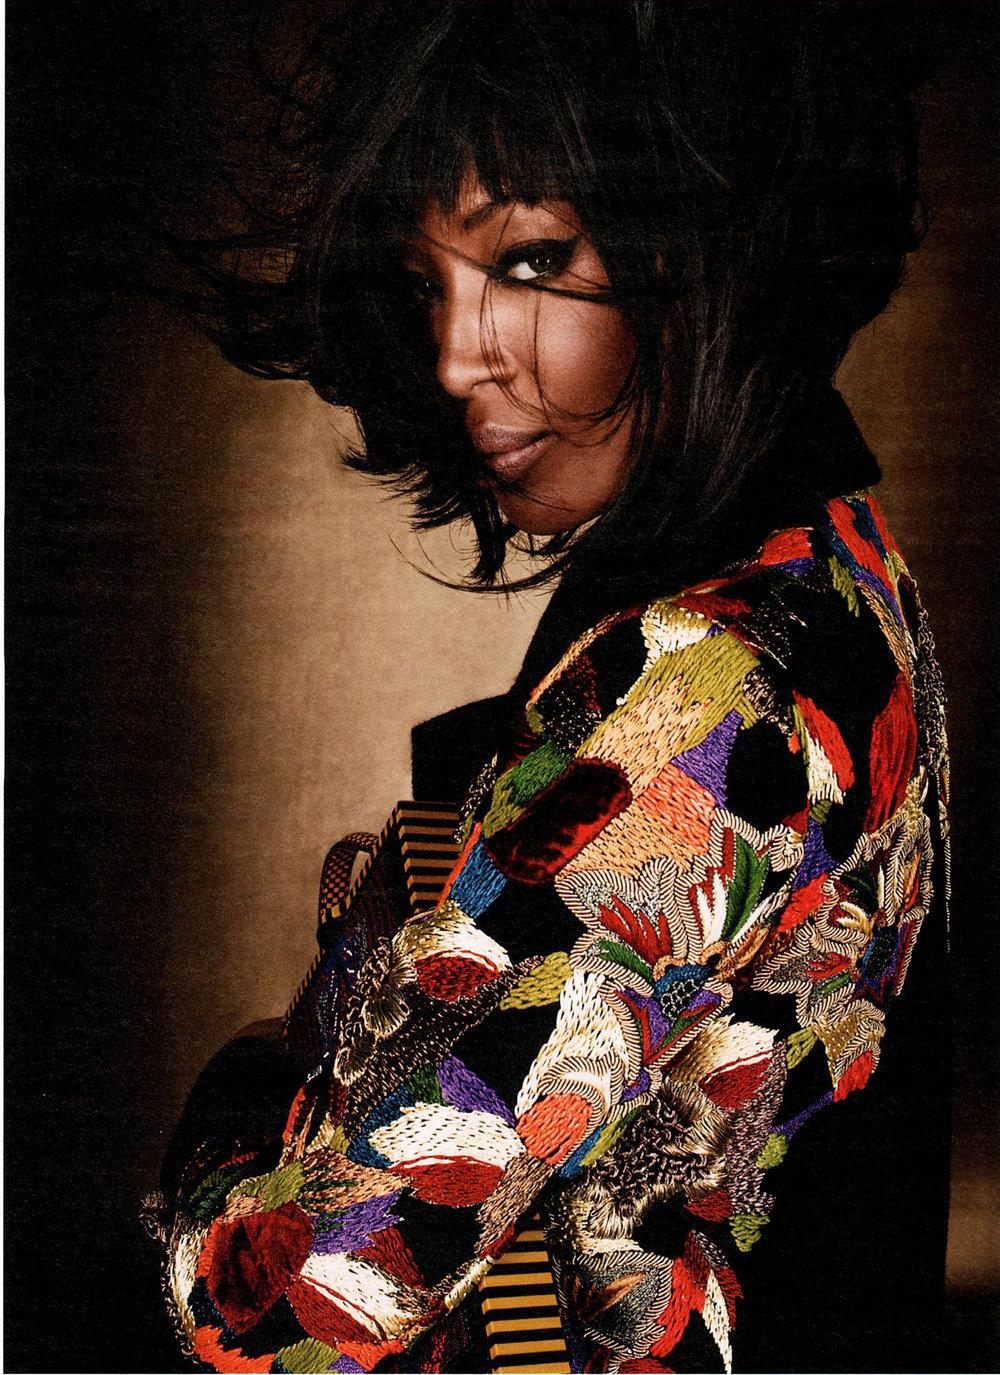 Giovanna-Battaglia-2-Luxe-be-a-Lady-W-Magazine-Emma-Summerton-Naomi-Campbell.jpg